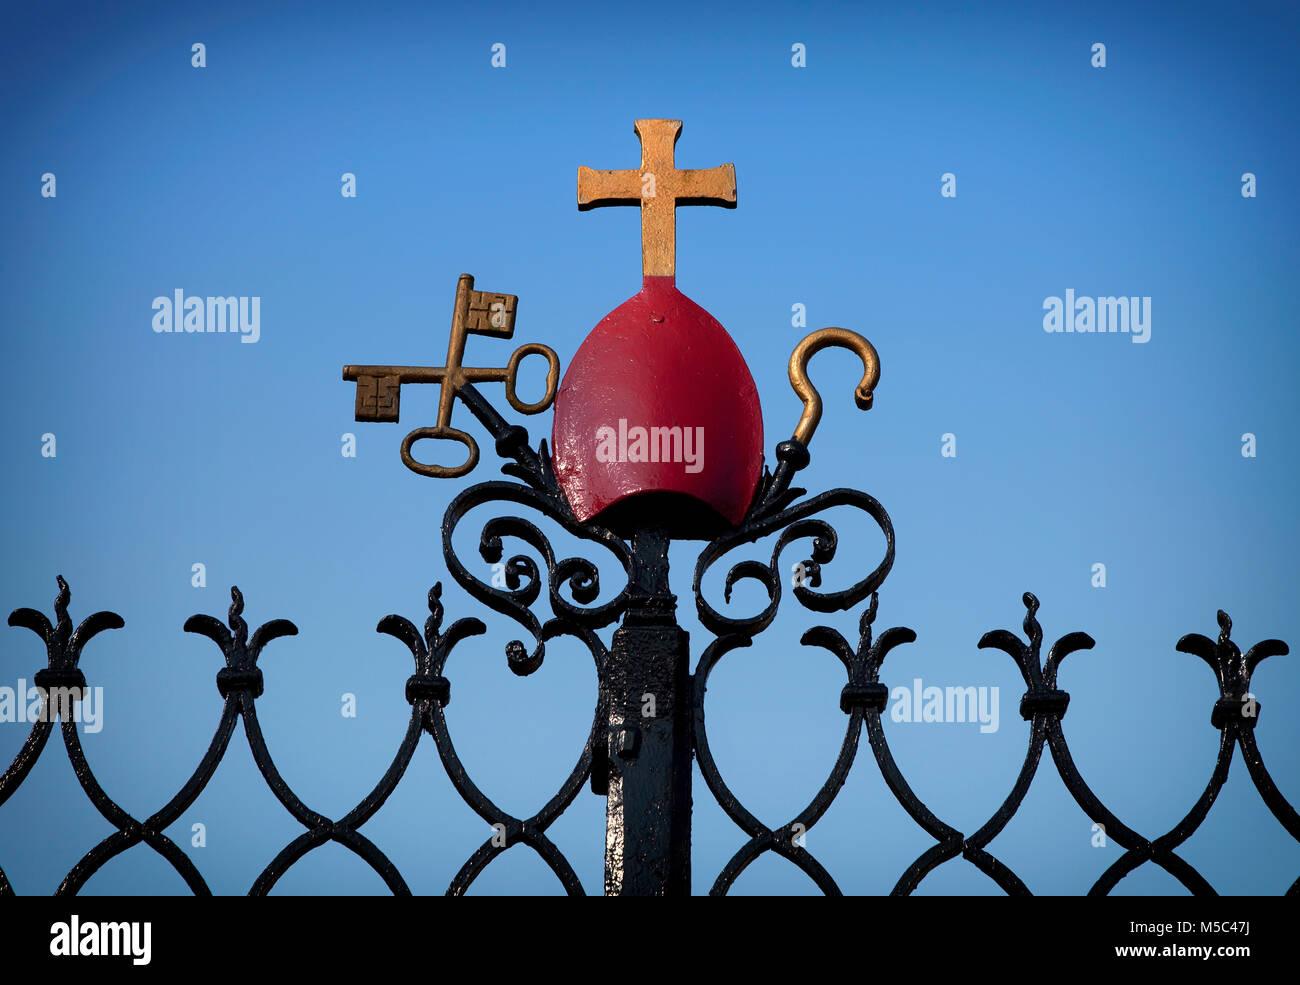 Christliche Symbolik an den Eingangstoren zu St Carthagh Altstadthügels, Lismore, Grafschaft Waterford, Irland Stockbild